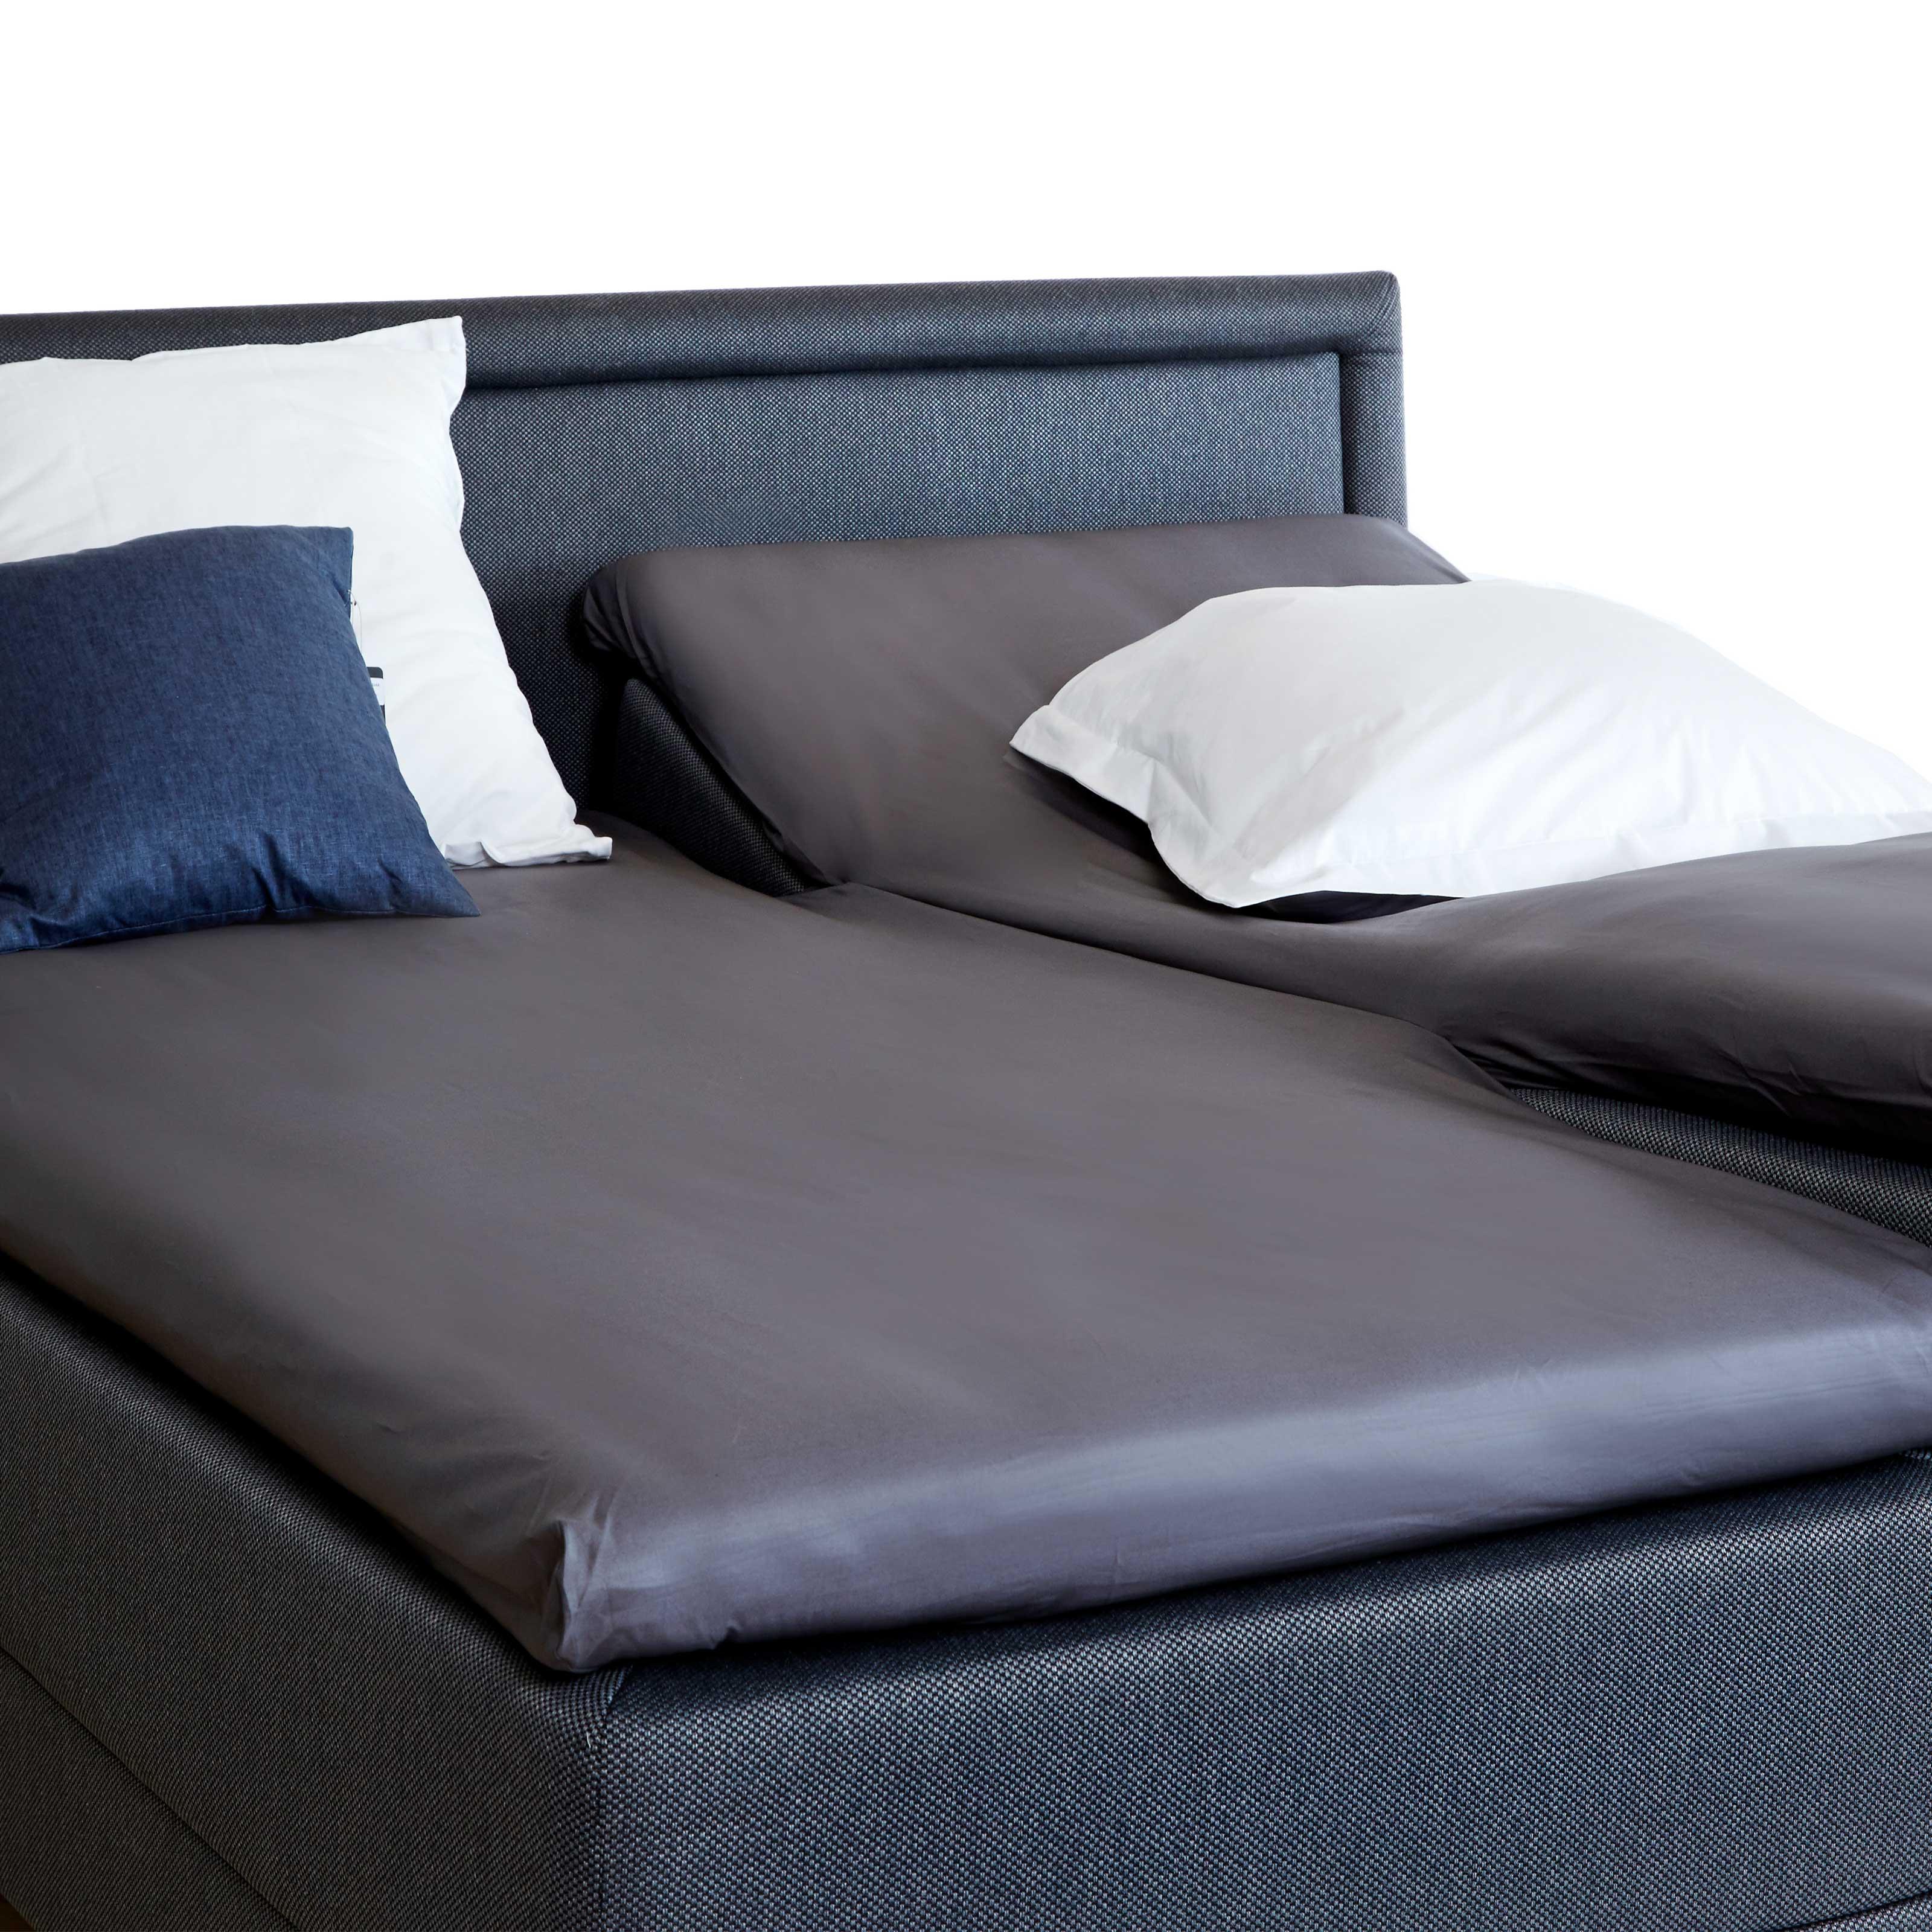 Image of   Unikka kuvertlagen H180x210x10 cm mørkegrå/bomuld